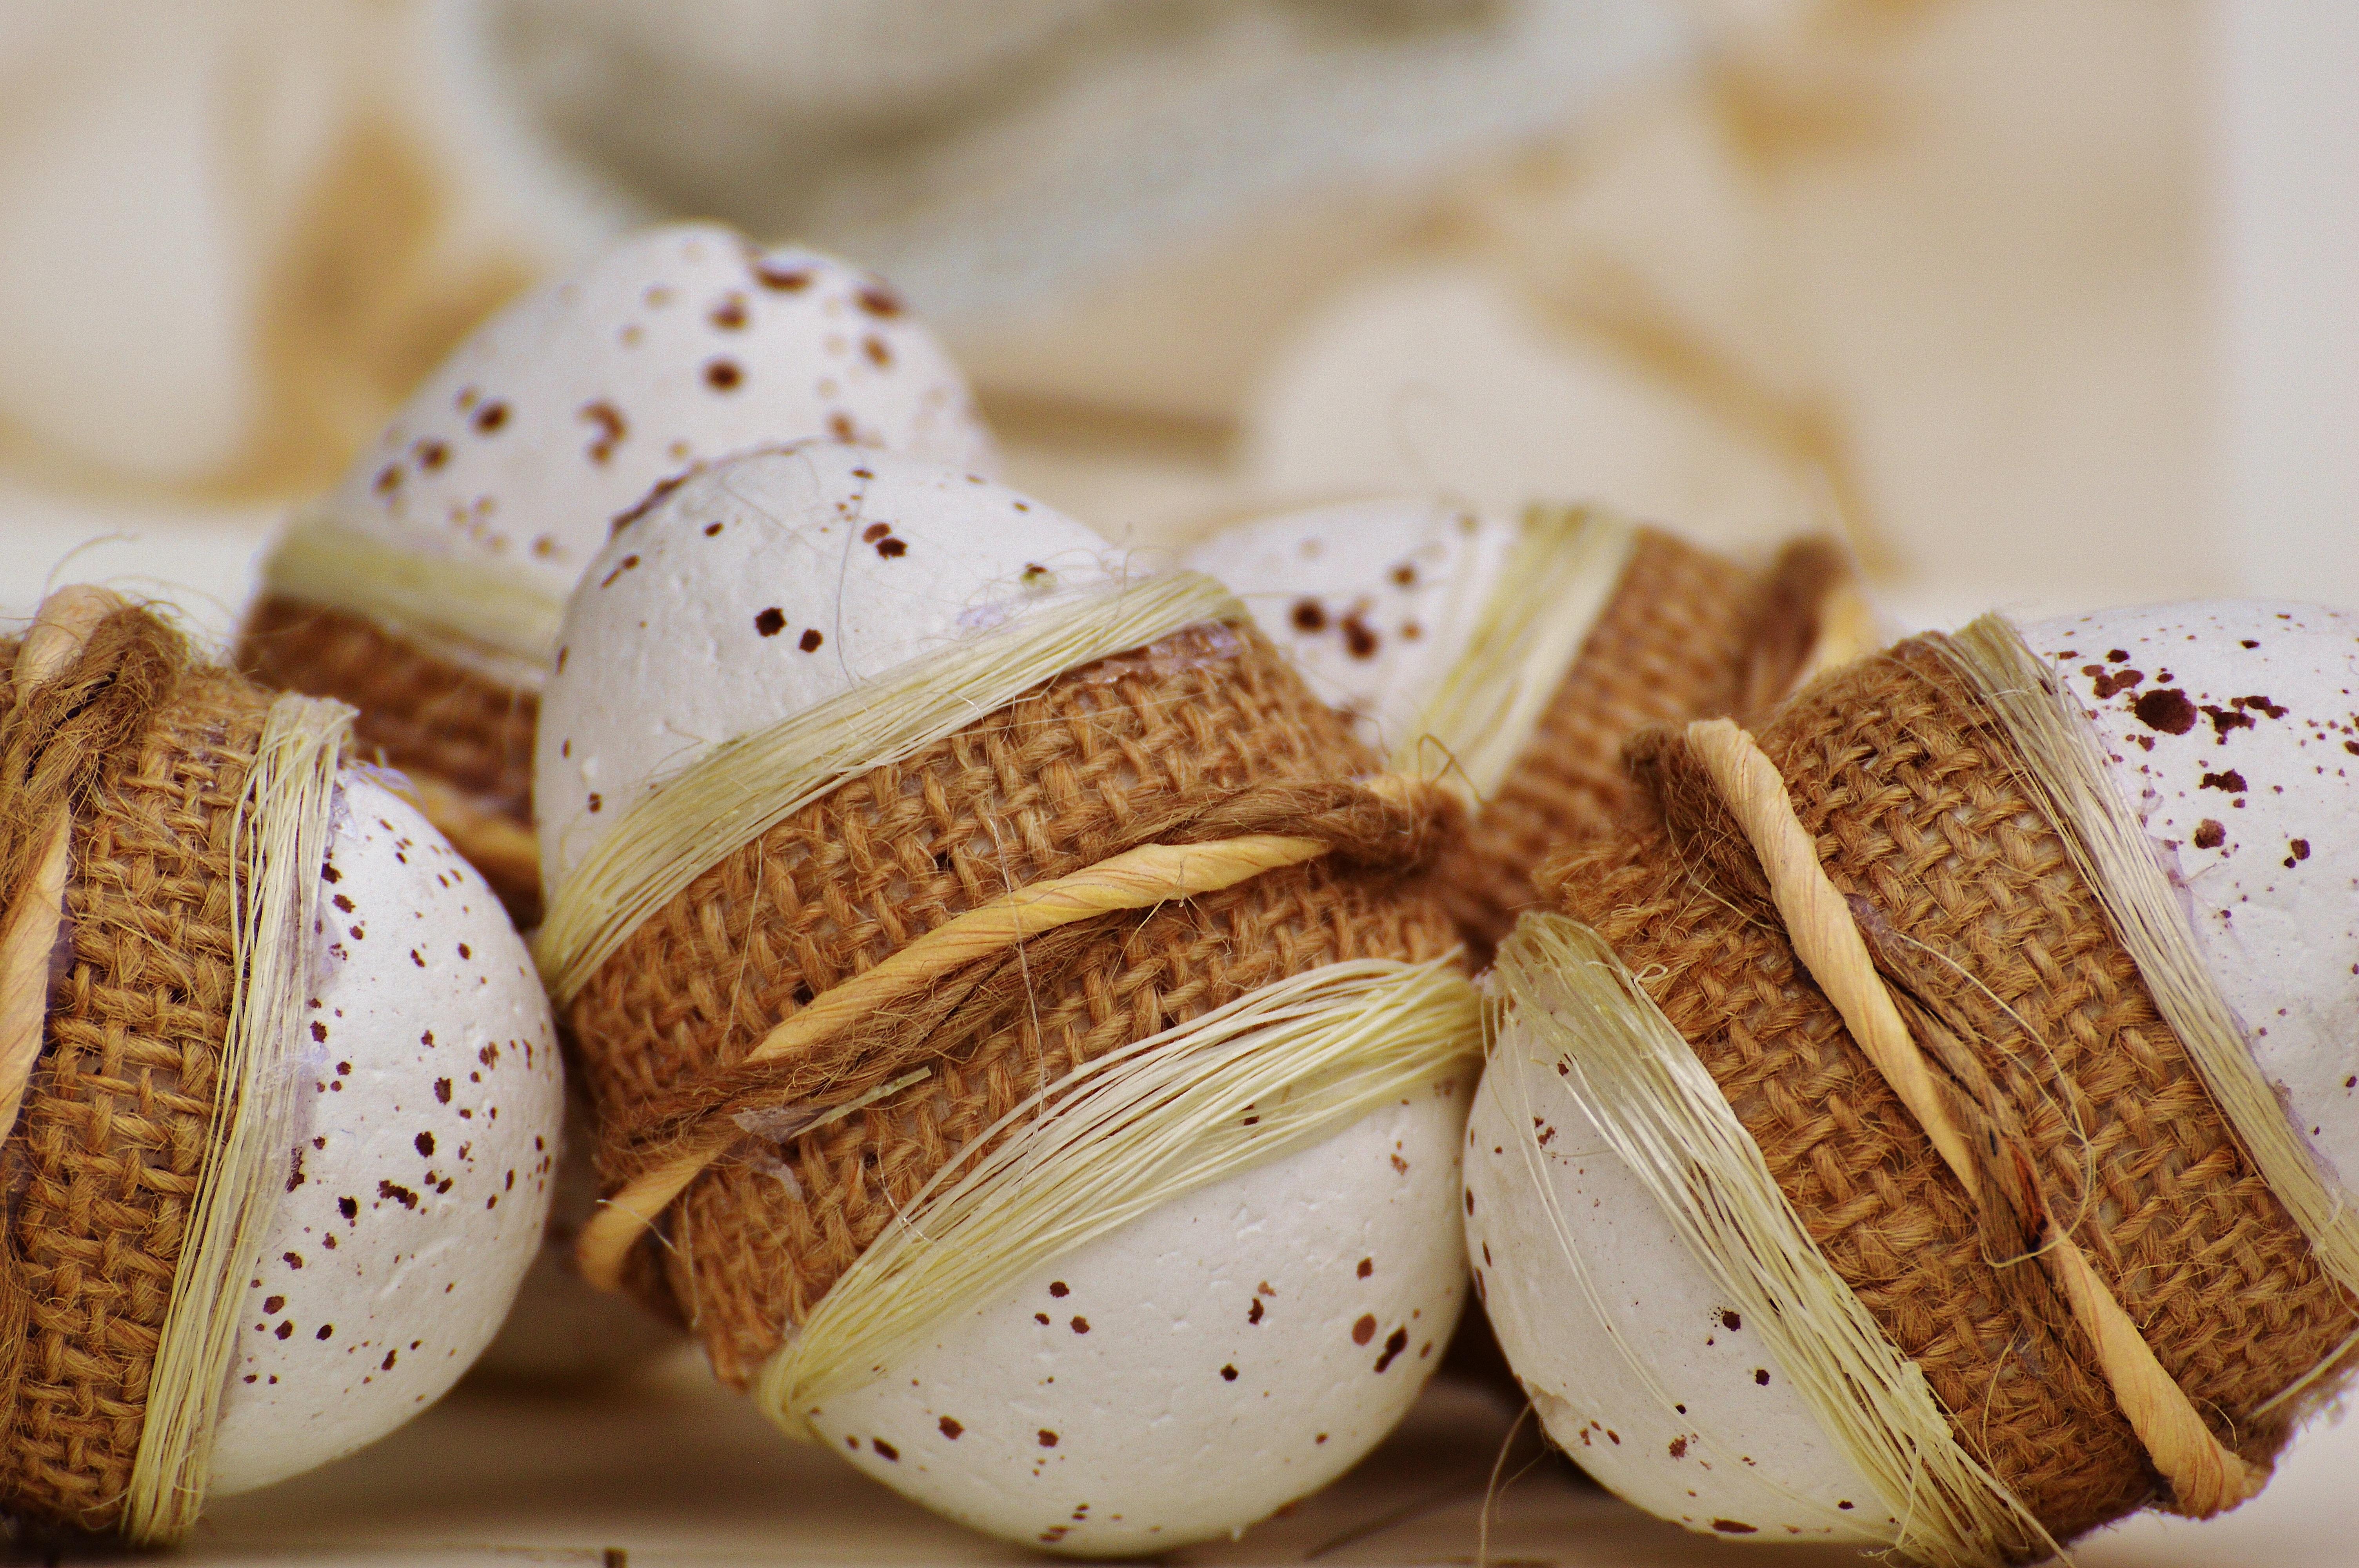 Free Images : decoration, pattern, produce, baking, close, macaroon ...